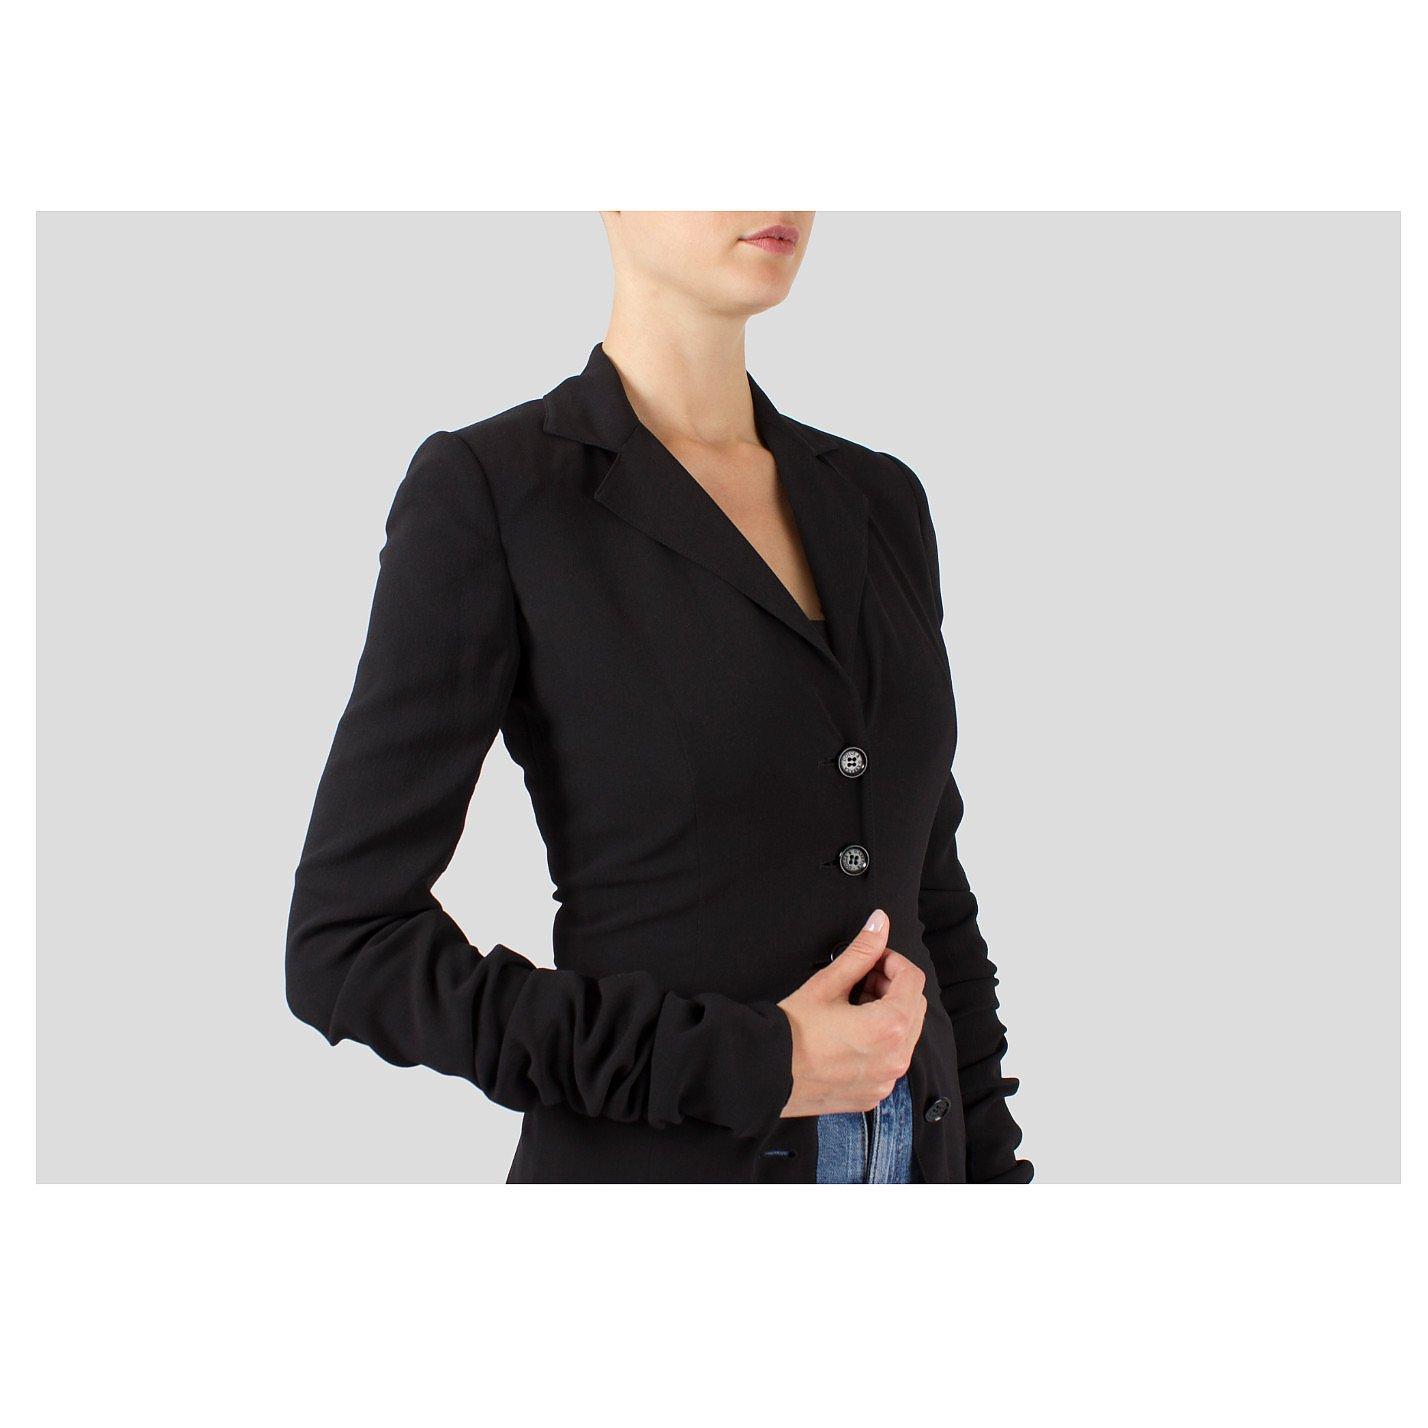 DOLCE & GABBANA Blazer Shirt Suit